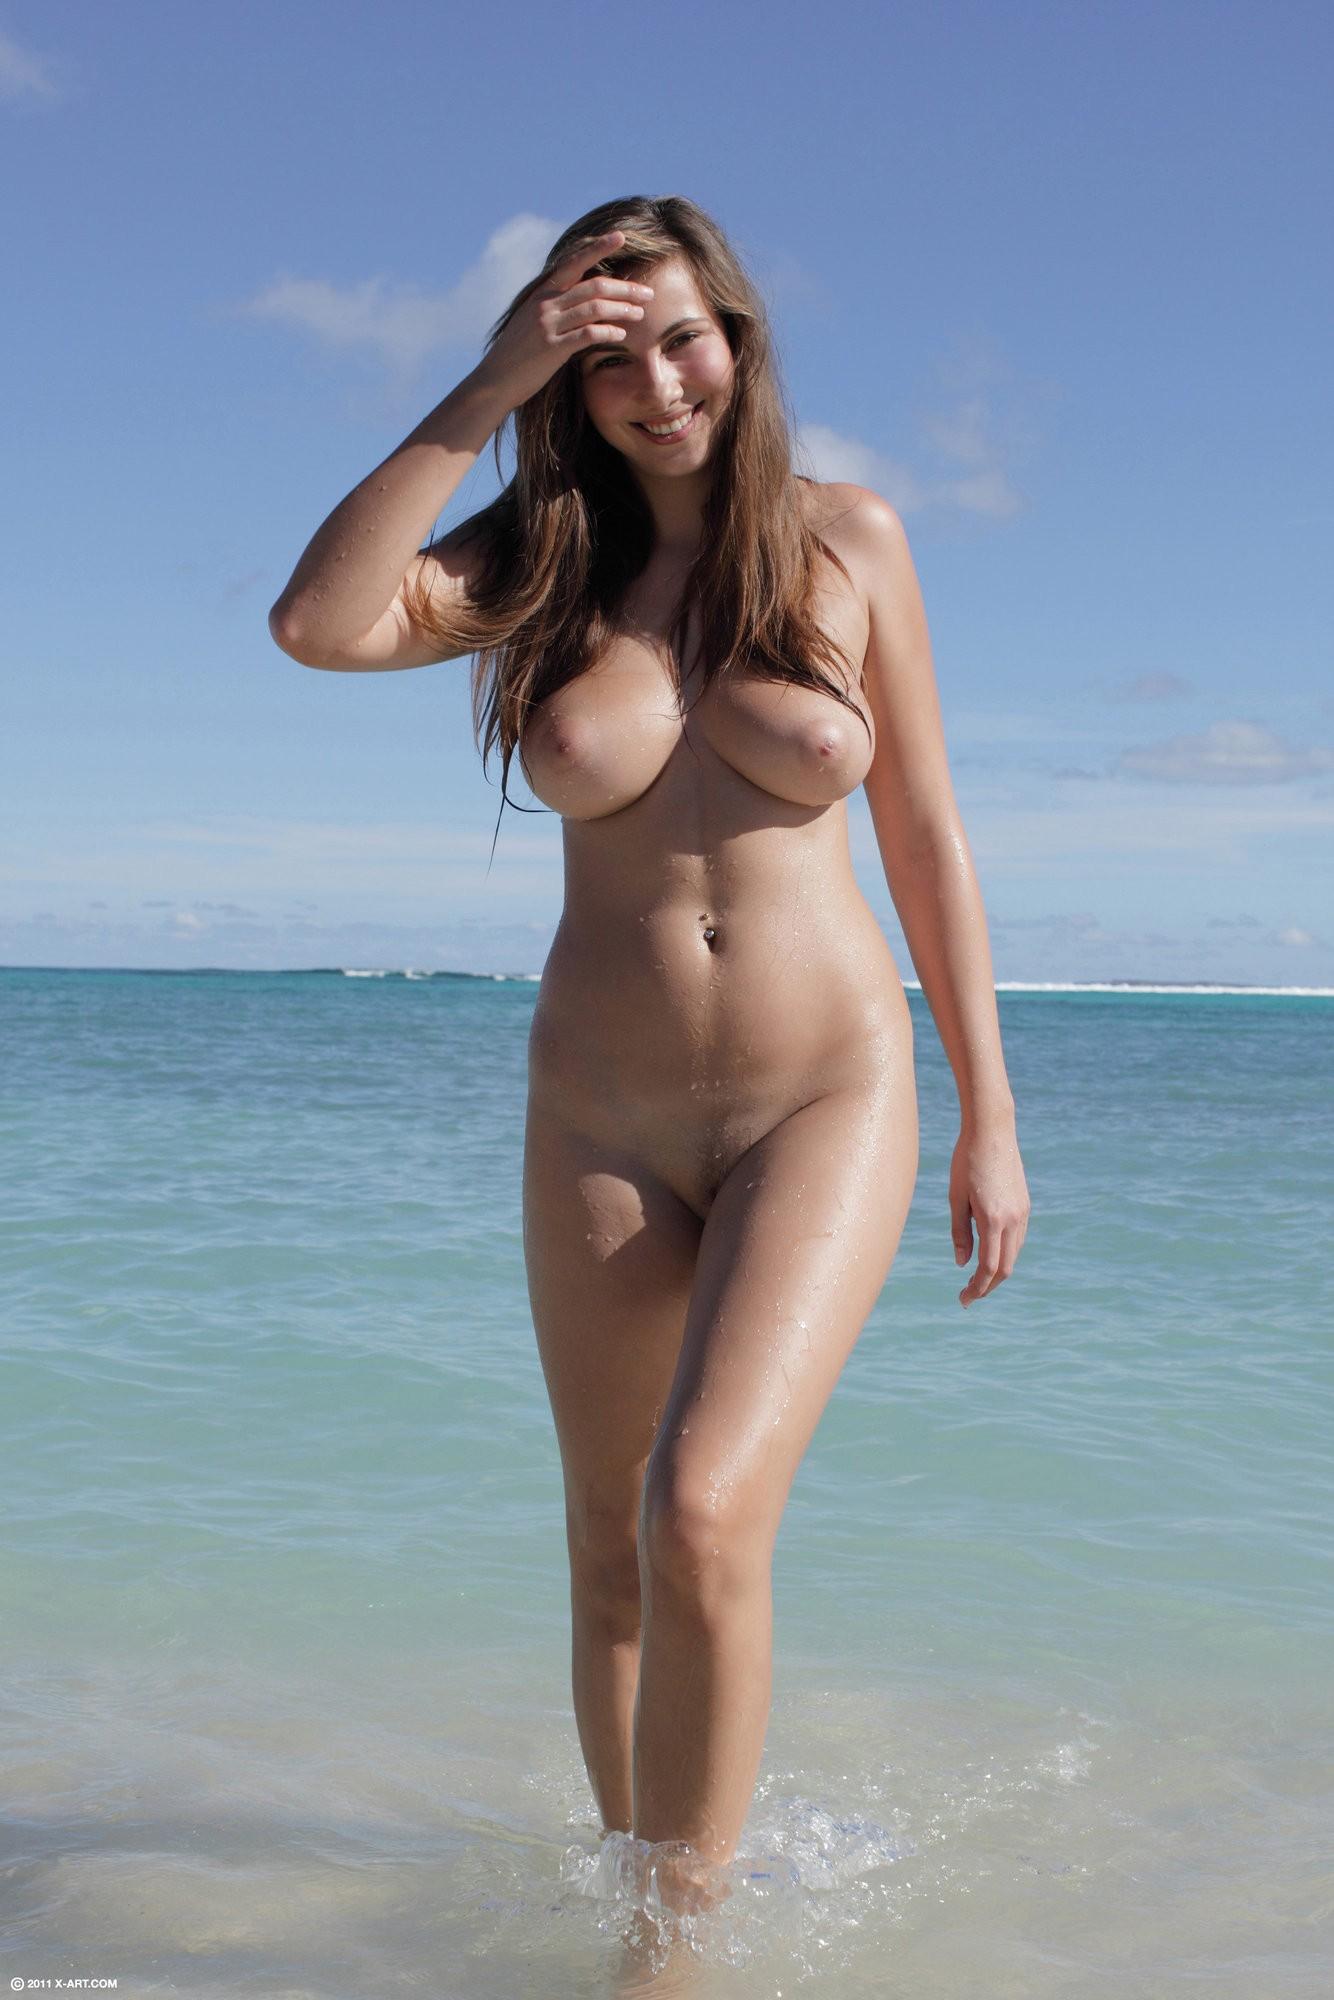 julian jox anal sex porn videos